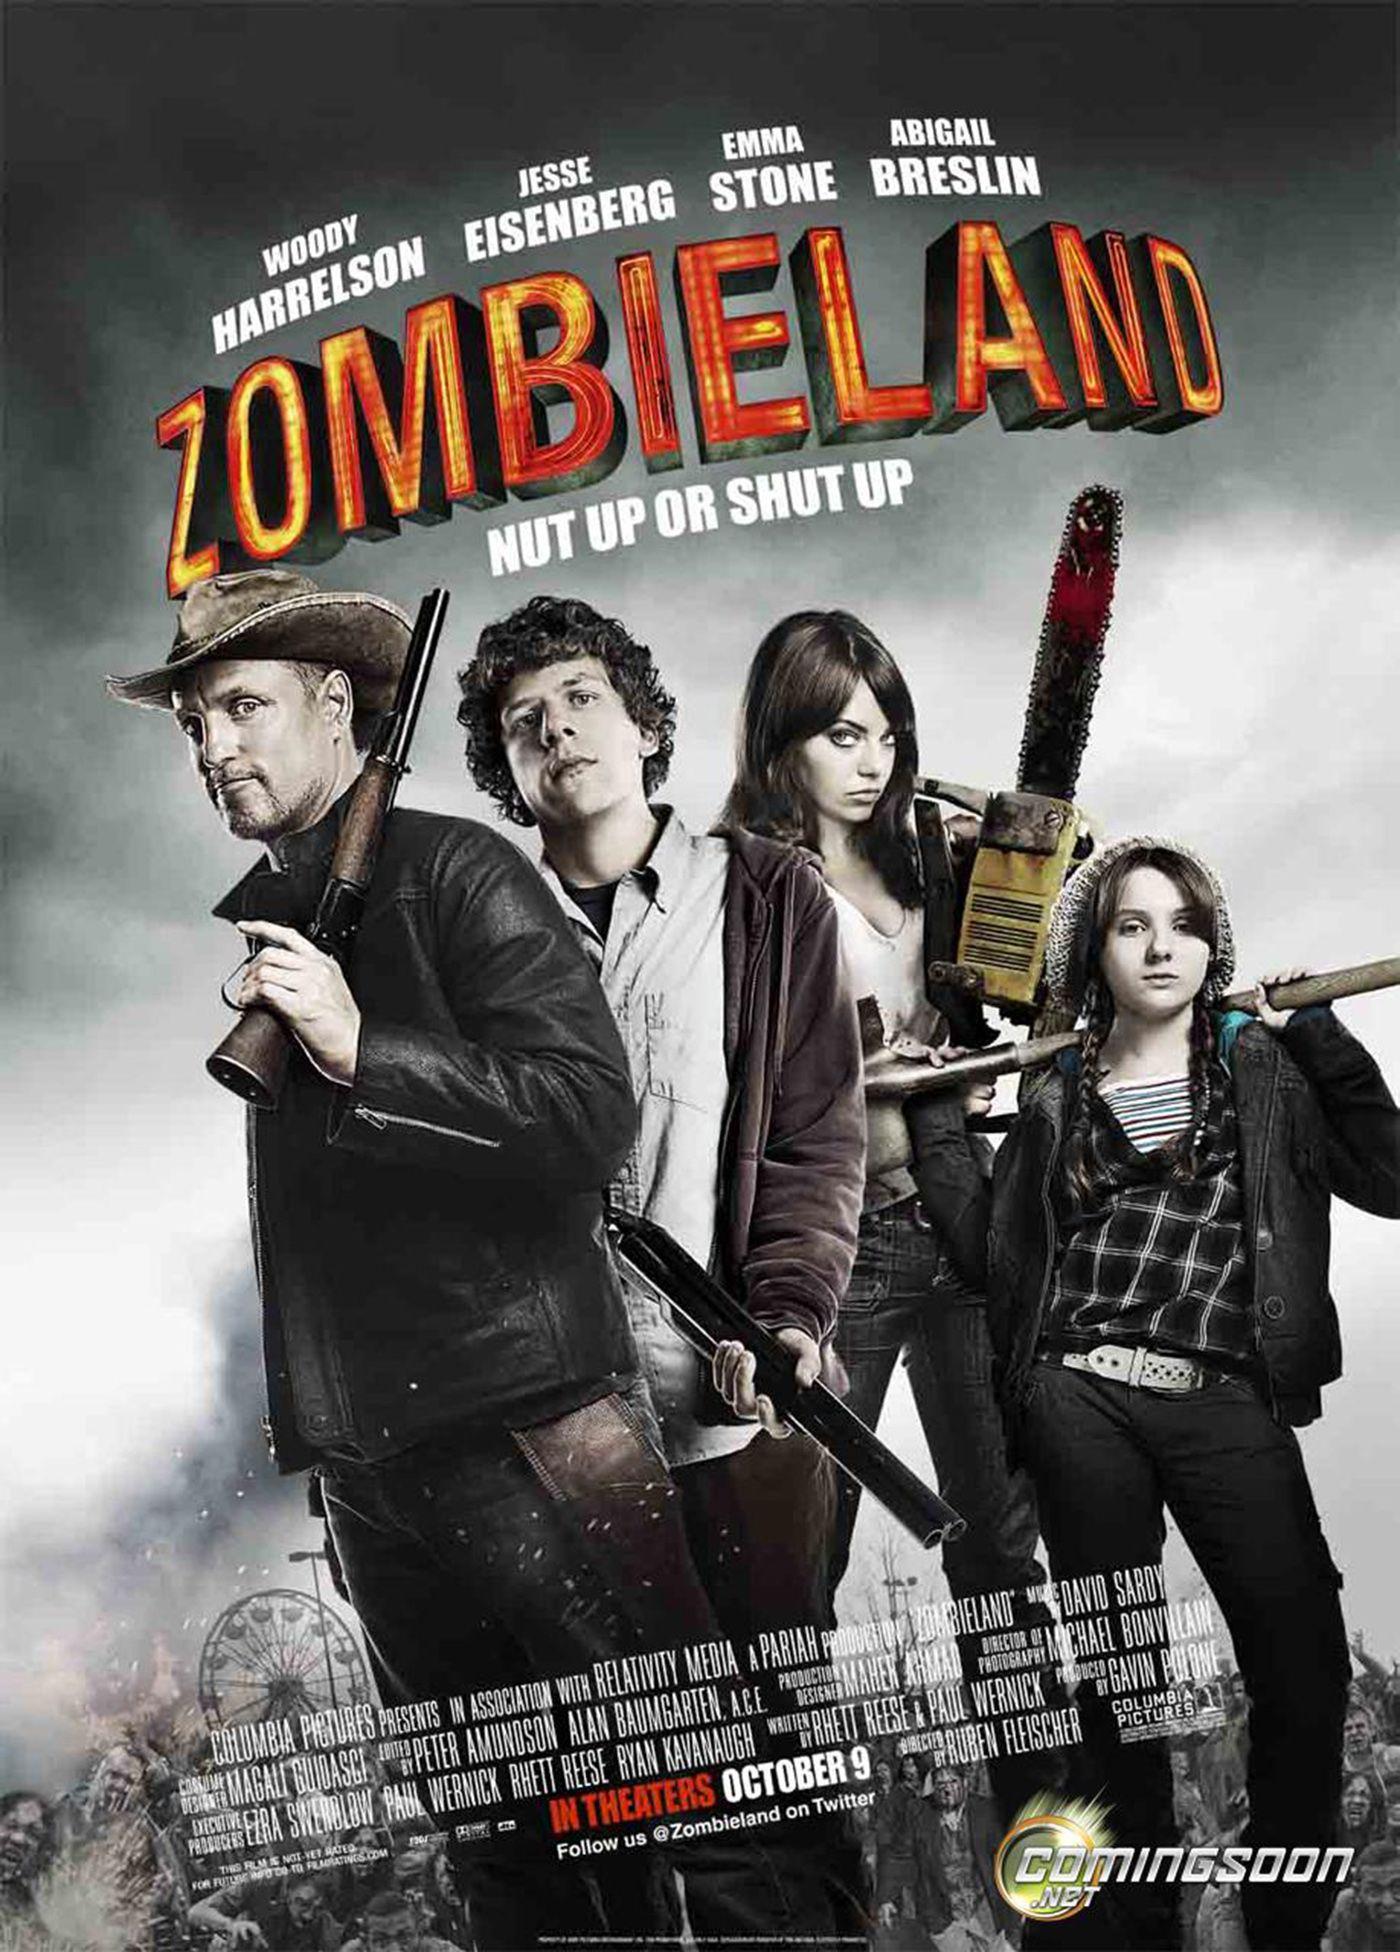 Zombieland Zumbilandia In Brasil Com Imagens Filmes